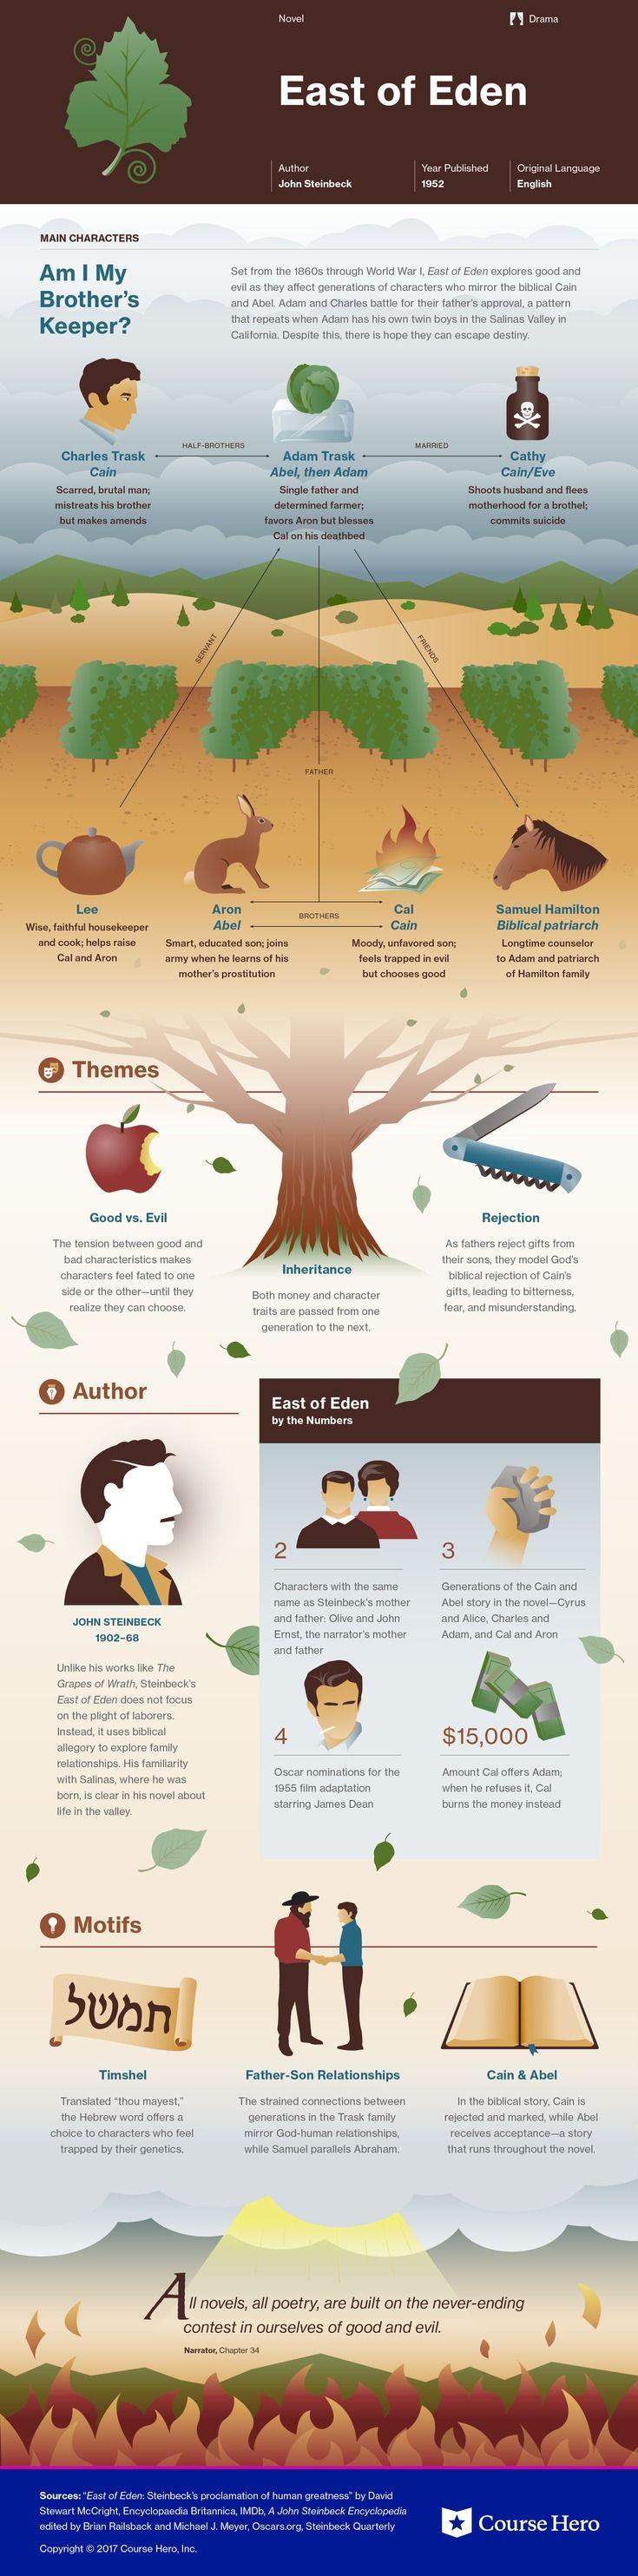 Neuromancer study guide